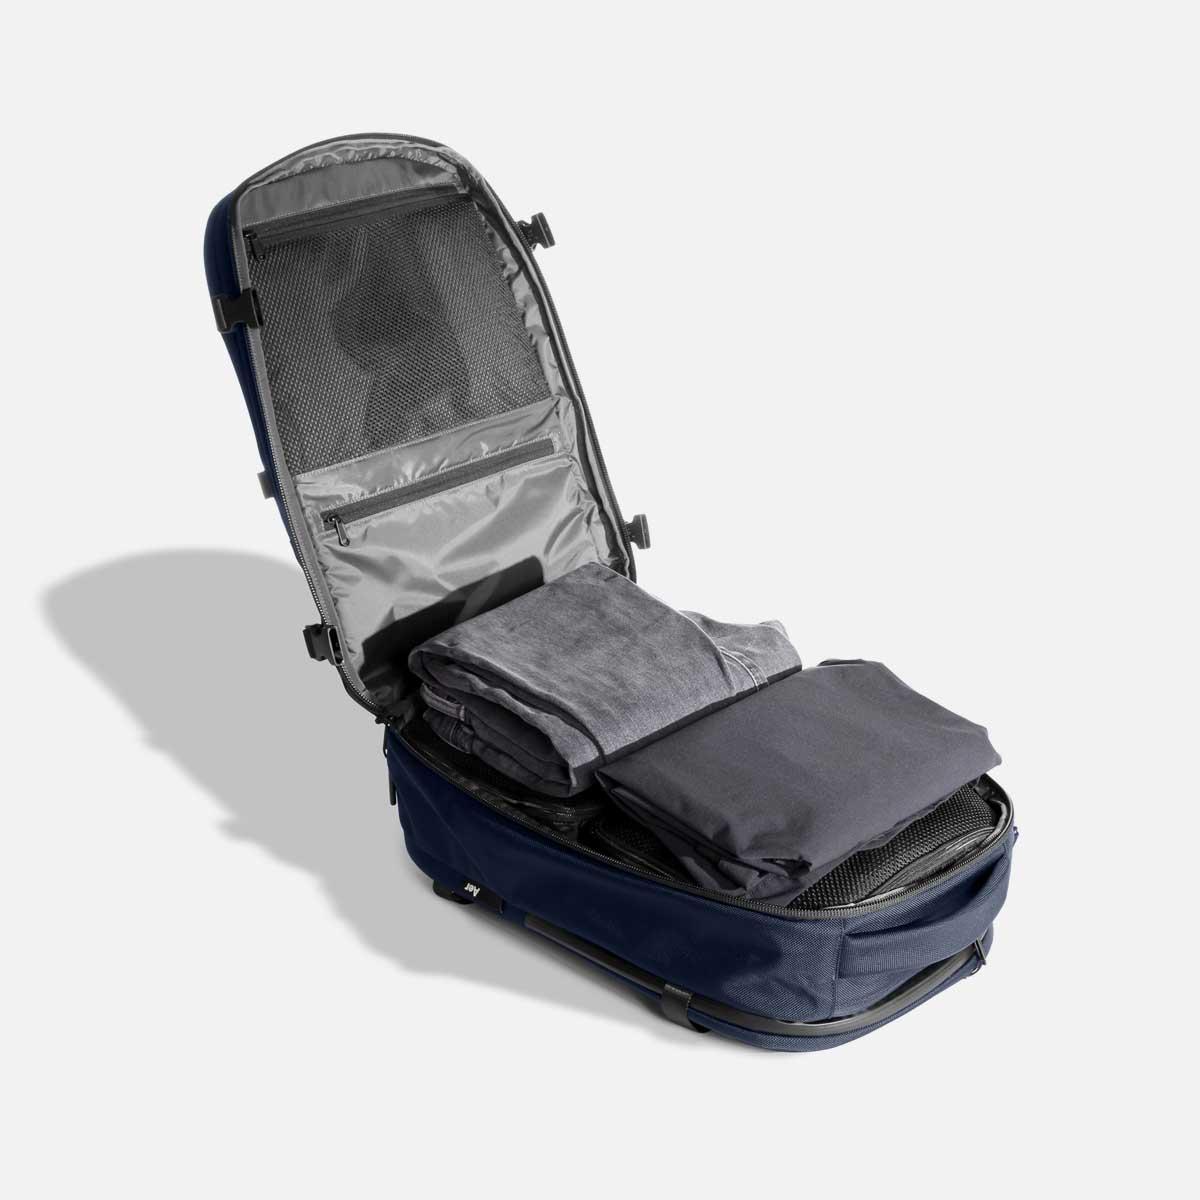 23007_travelpack2_navy_maincompartment.jpg